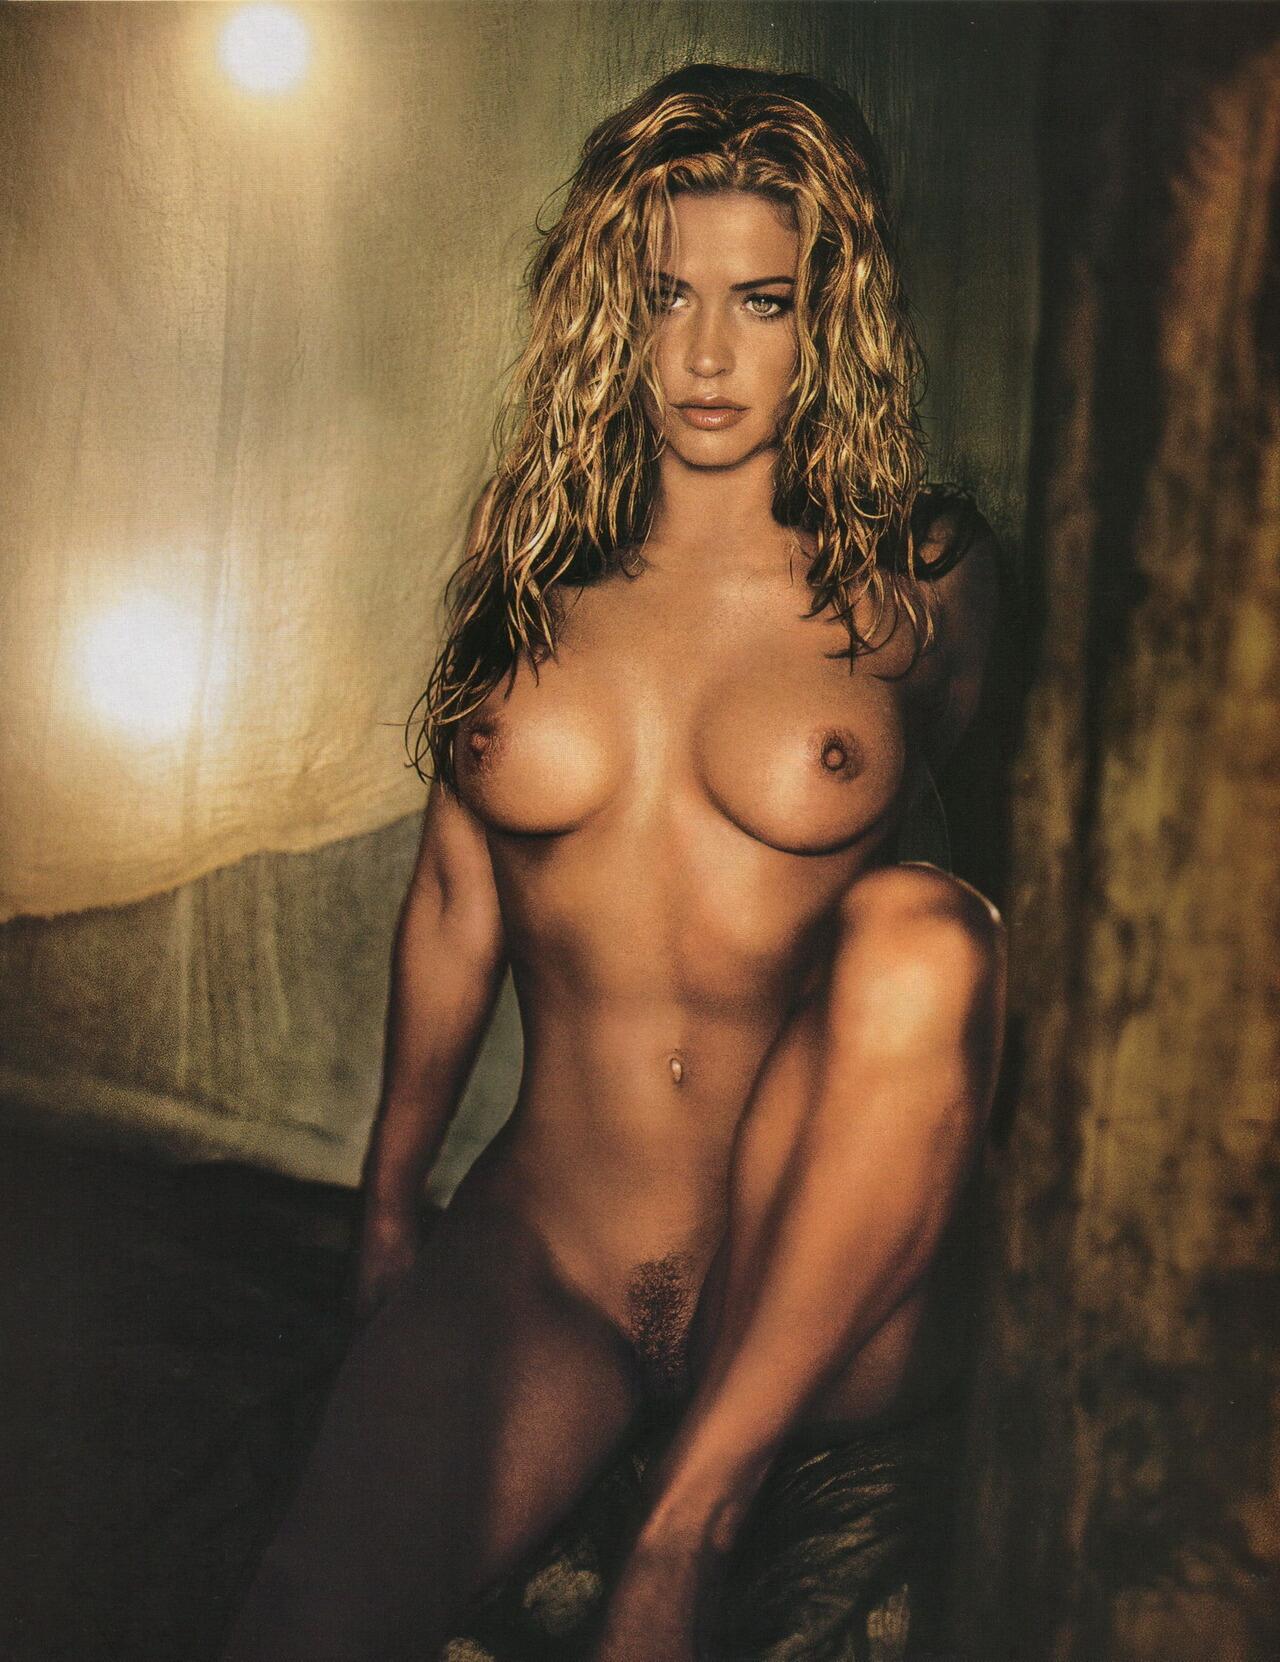 denise-richard-topless-punjabi-girls-sex-with-elder-man